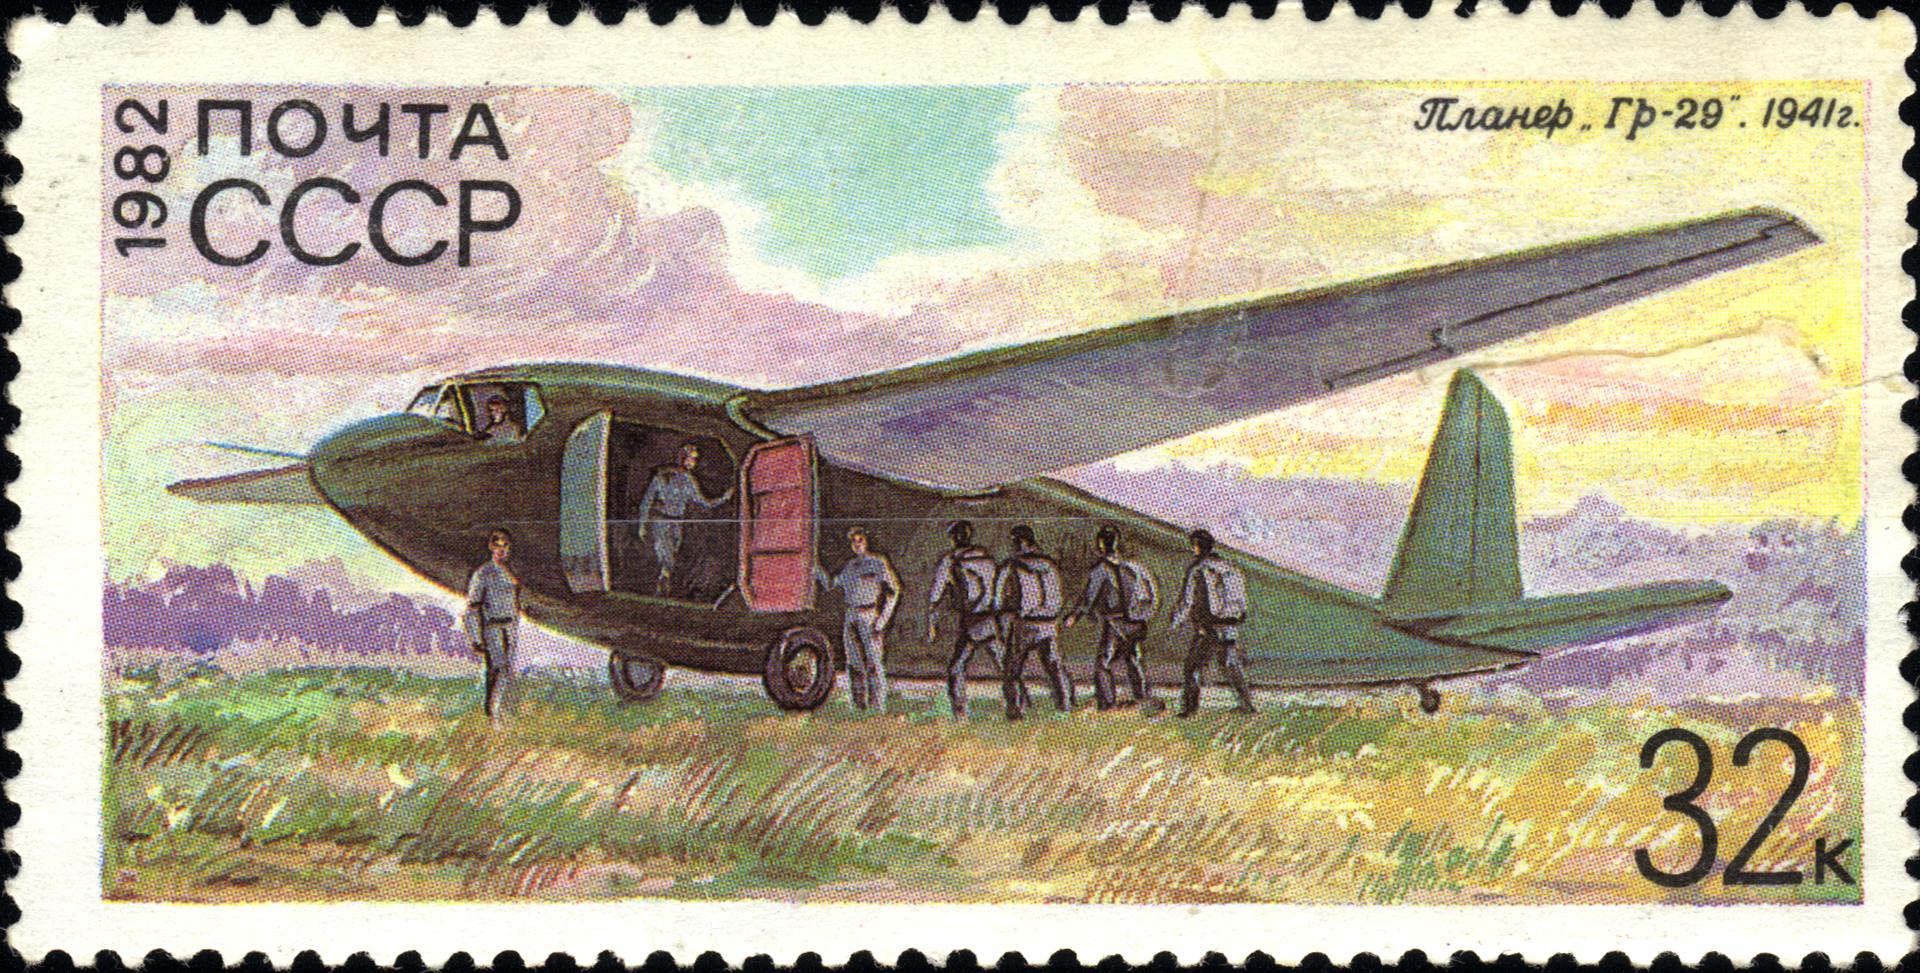 Jedrilica G-11 (Gr-29) na poštanskoj marki